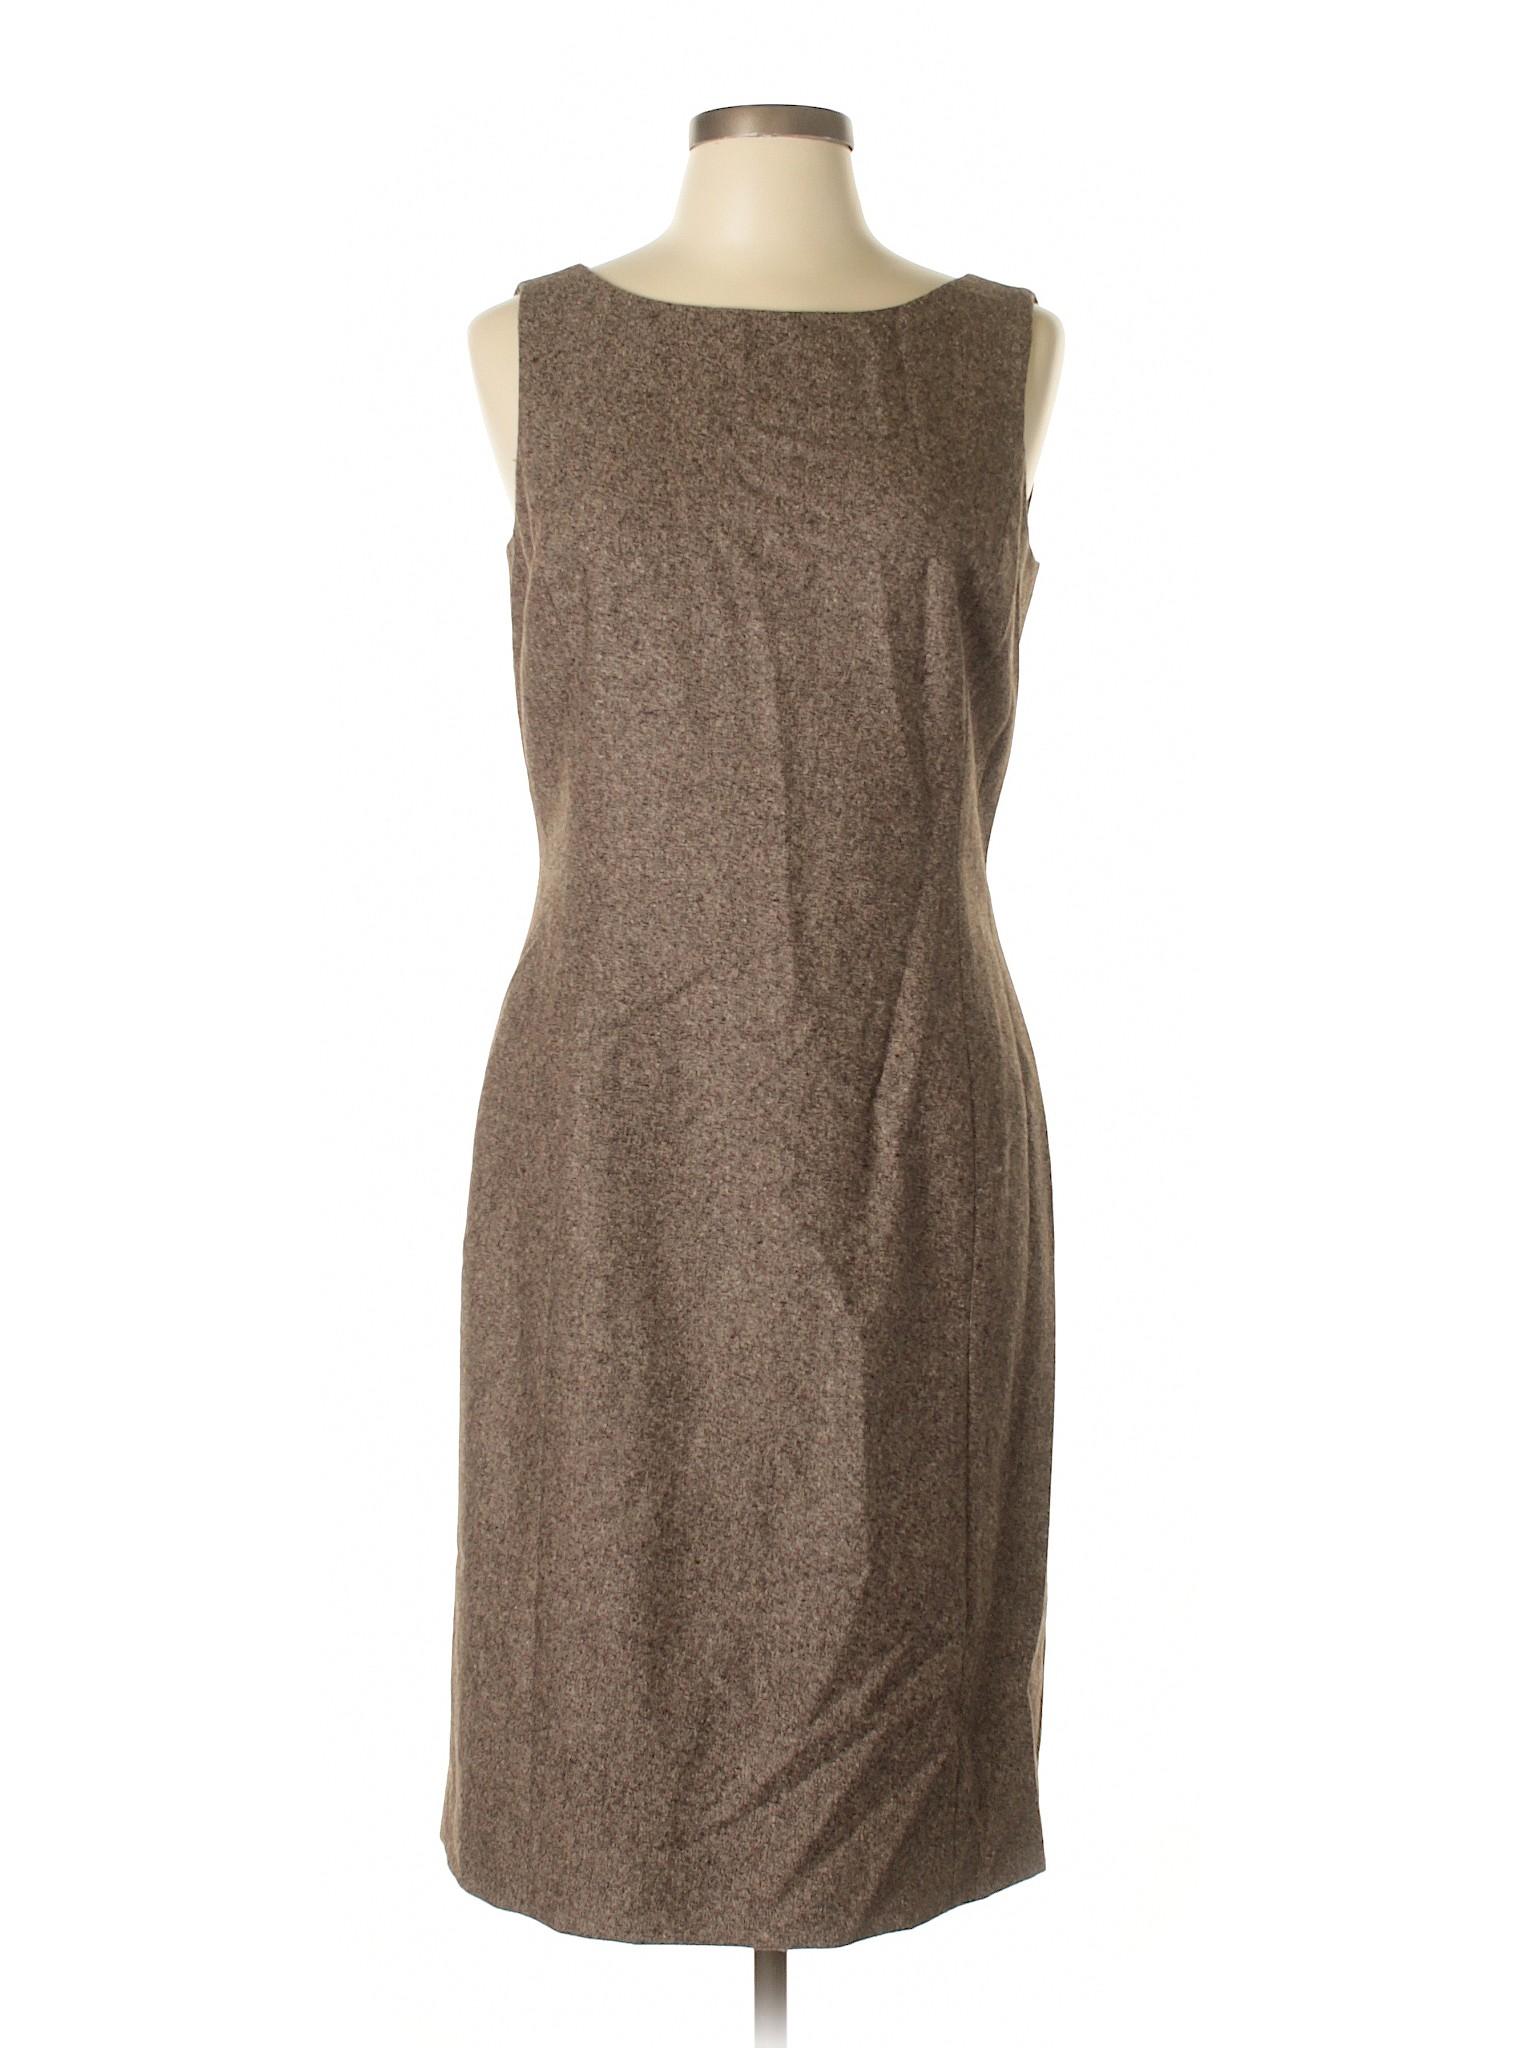 Casual Selling Taylor Taylor Ann Ann Casual Dress Ann Selling Selling Taylor Dress Dress Casual Selling wfRqnvOxgp